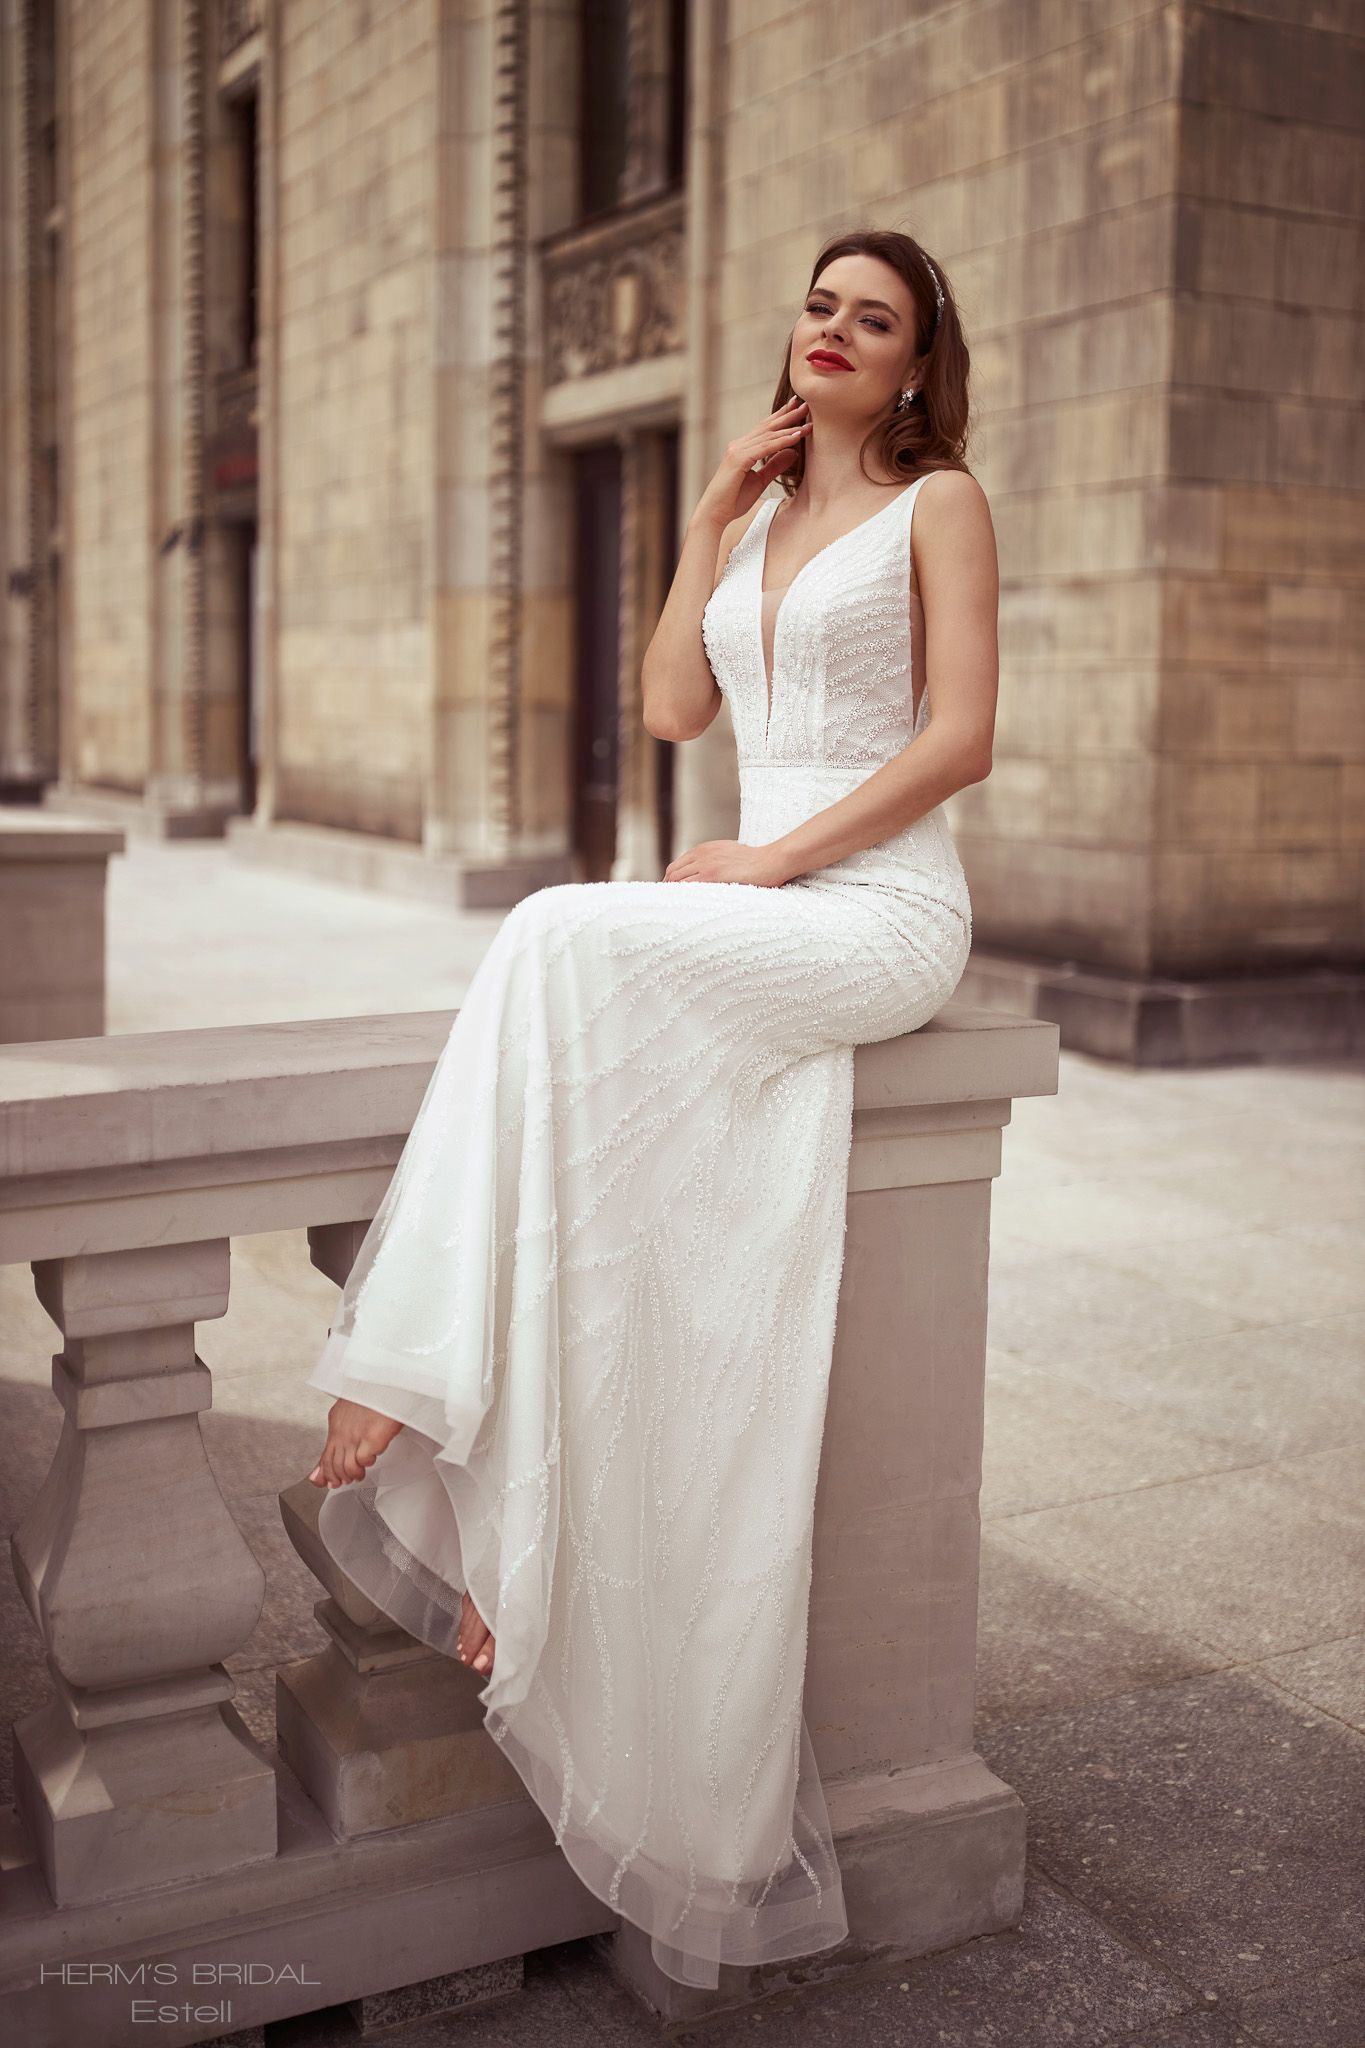 suknia slubna herms bridal Estell